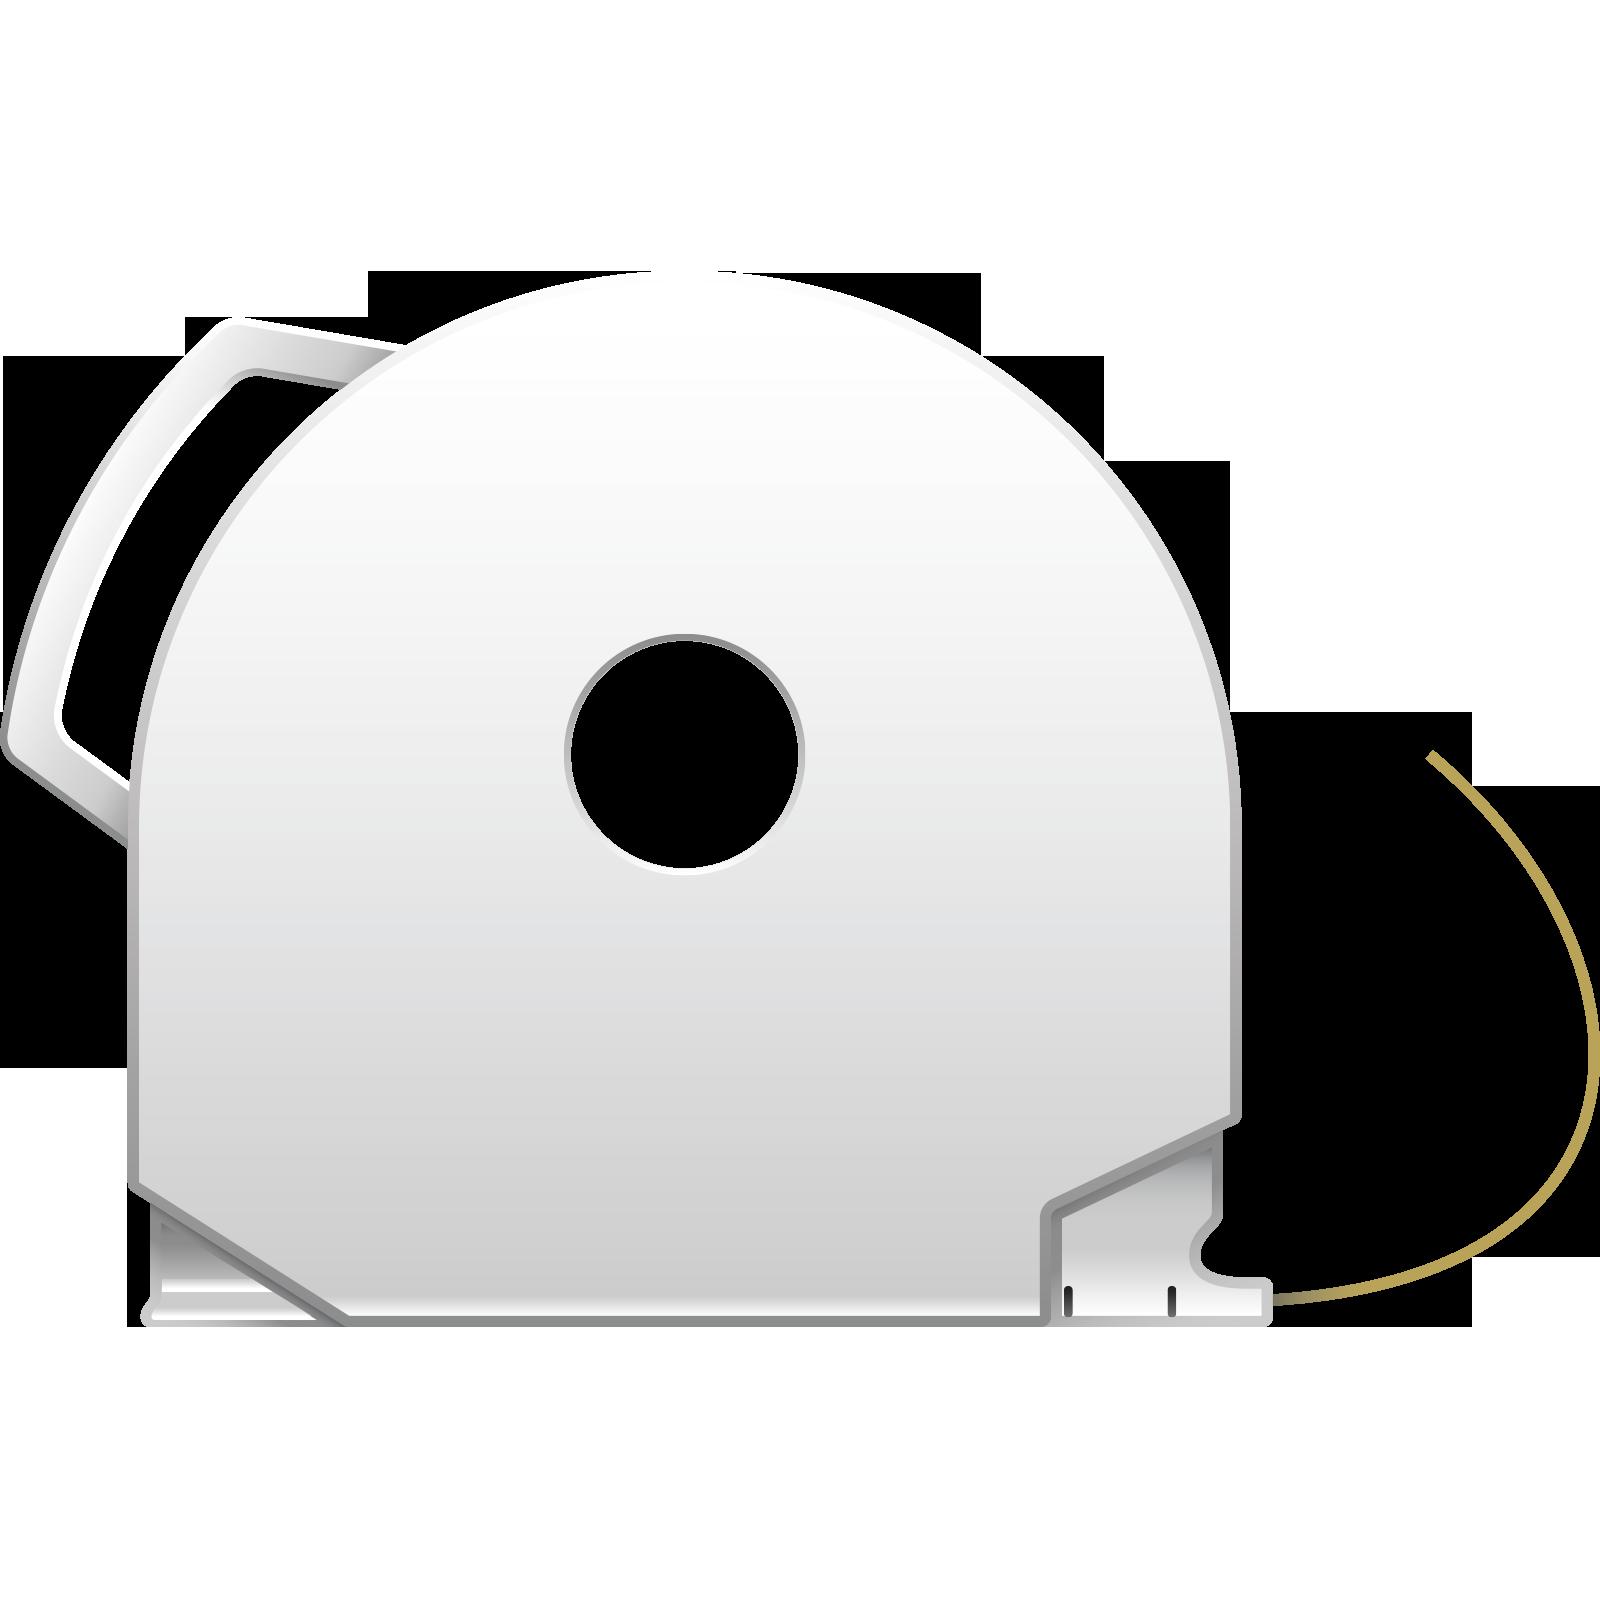 Tan CubePro 3D printer filament cartridge